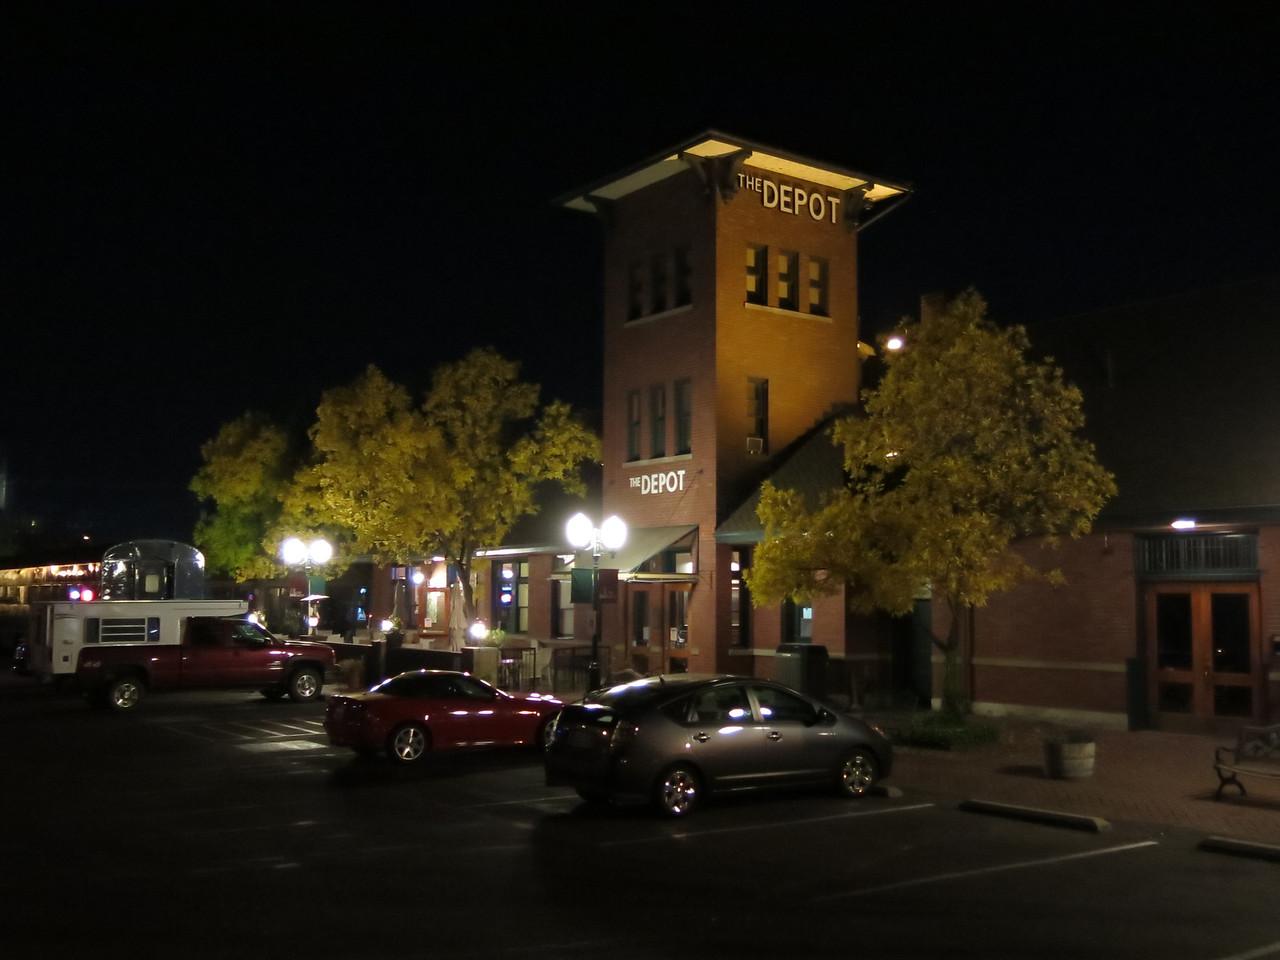 The Depot restaurant, where we had dinner.